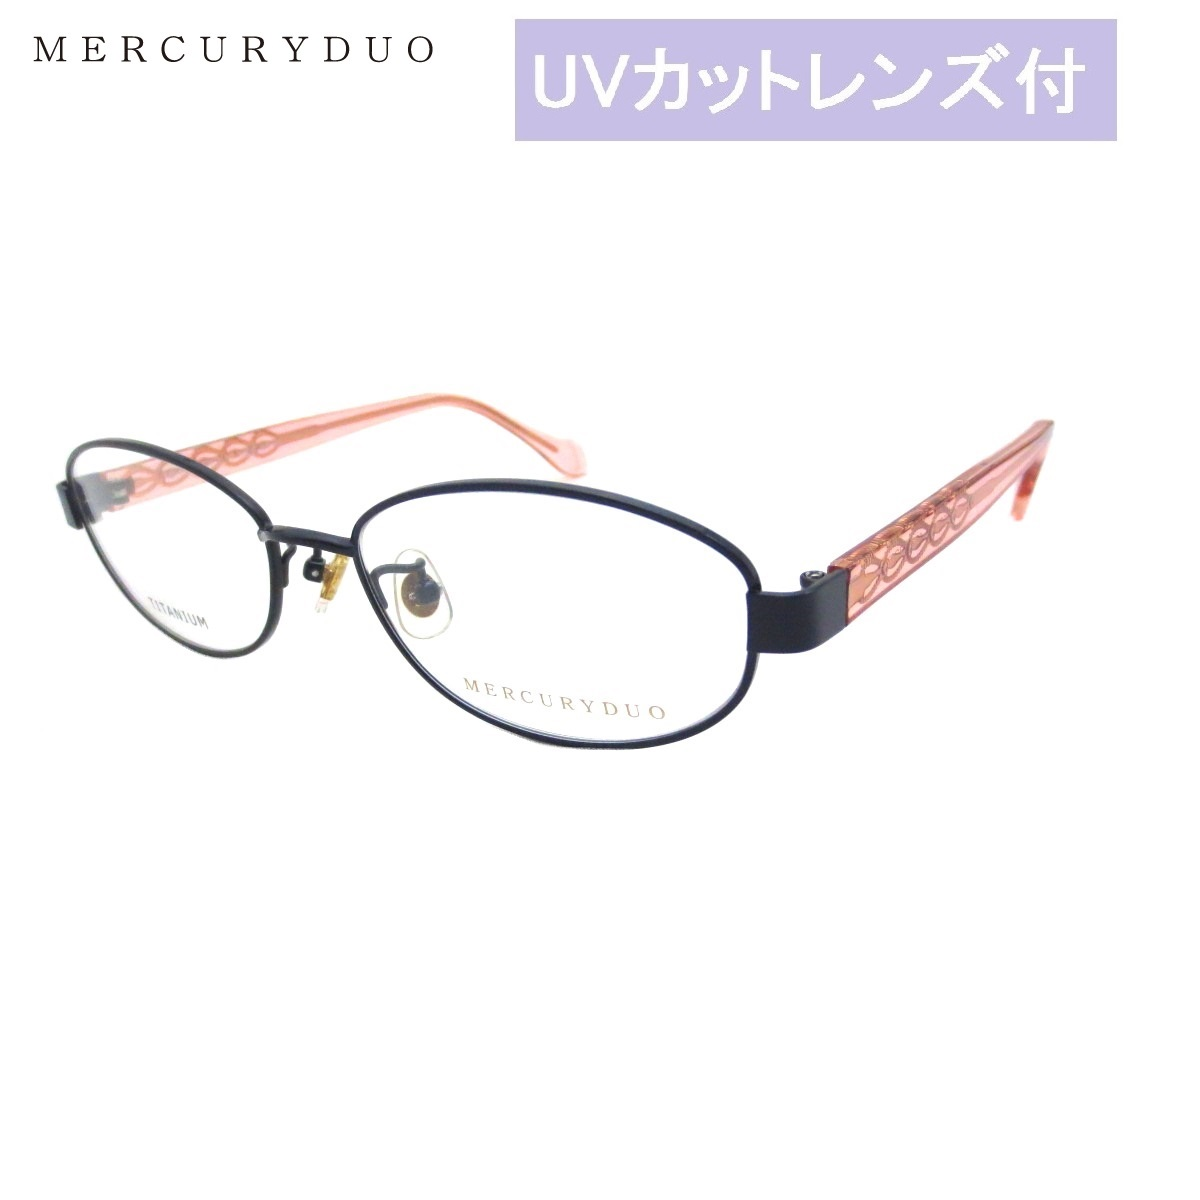 MERCURYDUO(マーキュリーデュオ)MDF6010 01(52)セミオーダー老眼鏡 中間度数有 UVカット(UV400)&防汚コート付レンズ +1.00 +1.25 +1.50 +1.75 +2.00 +2.25 +2.50 +2.75 +3.00 +3.50 +4.00【コンビニ受取対応商品】